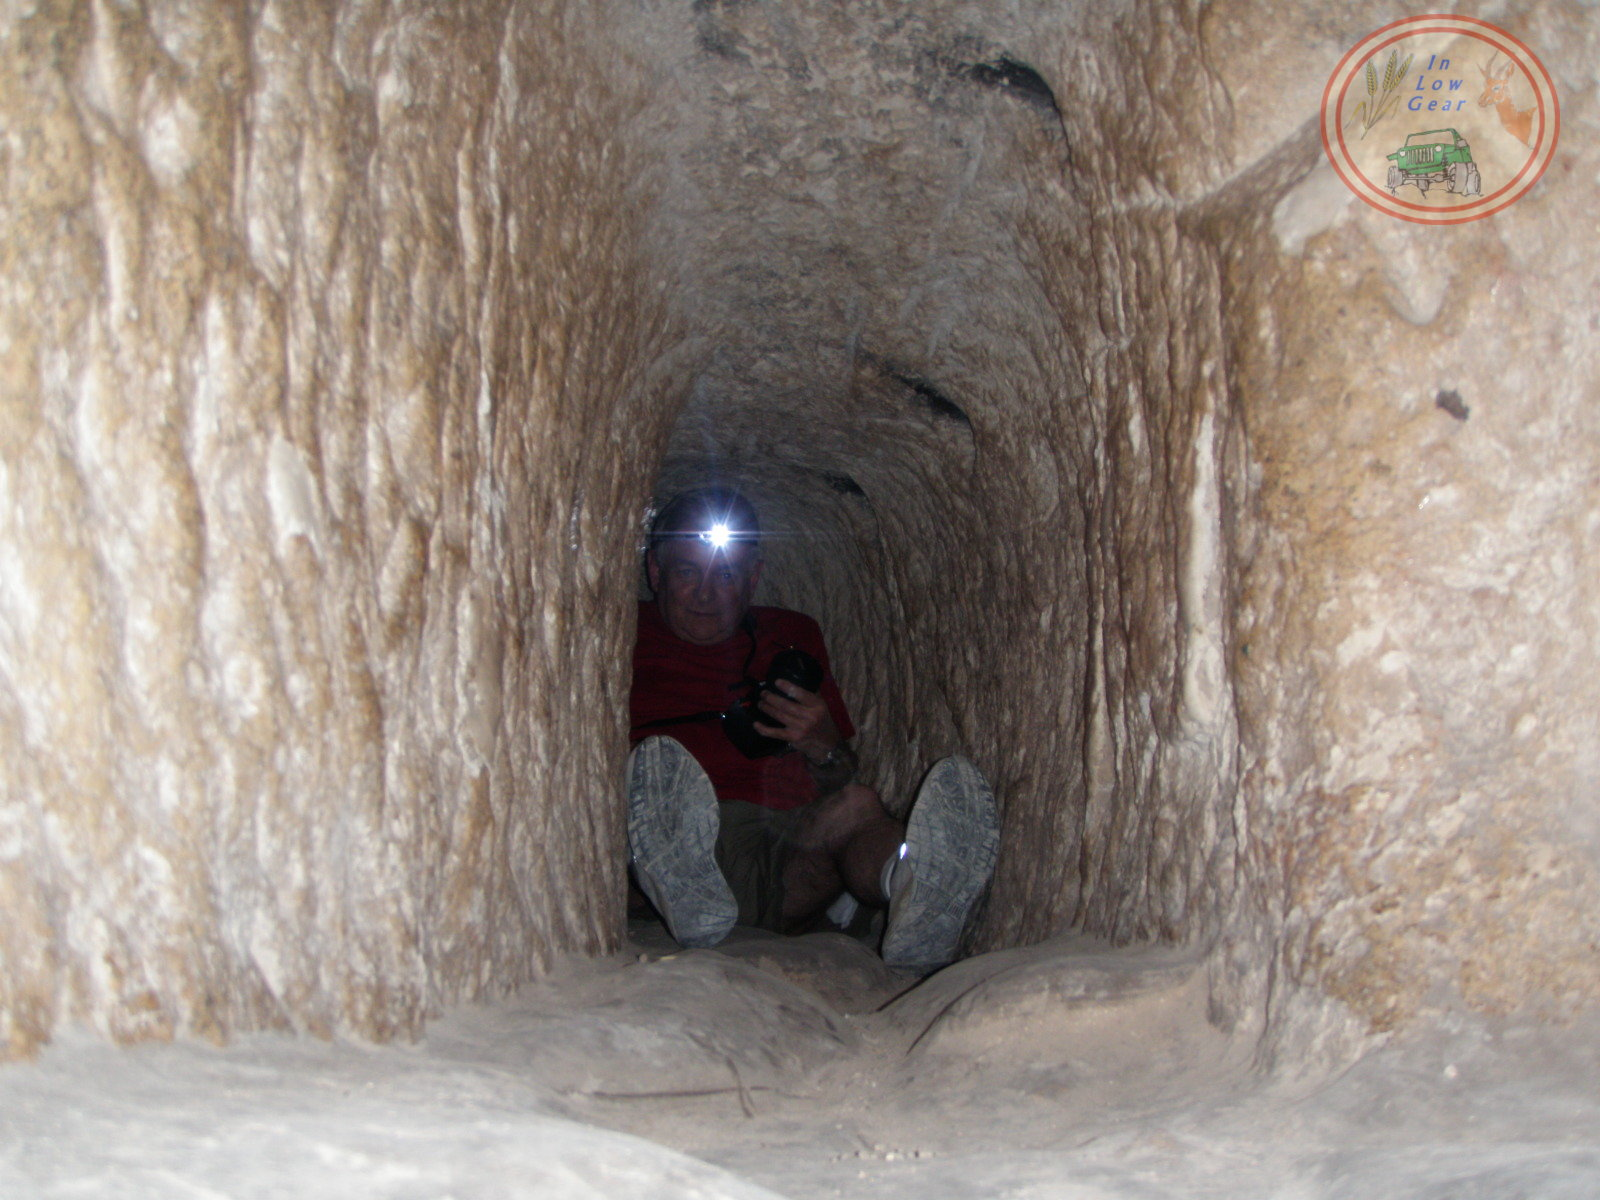 Tel Goded Bar Kochva land of a  thousand caves... תל גודד ארץ אלף המערות